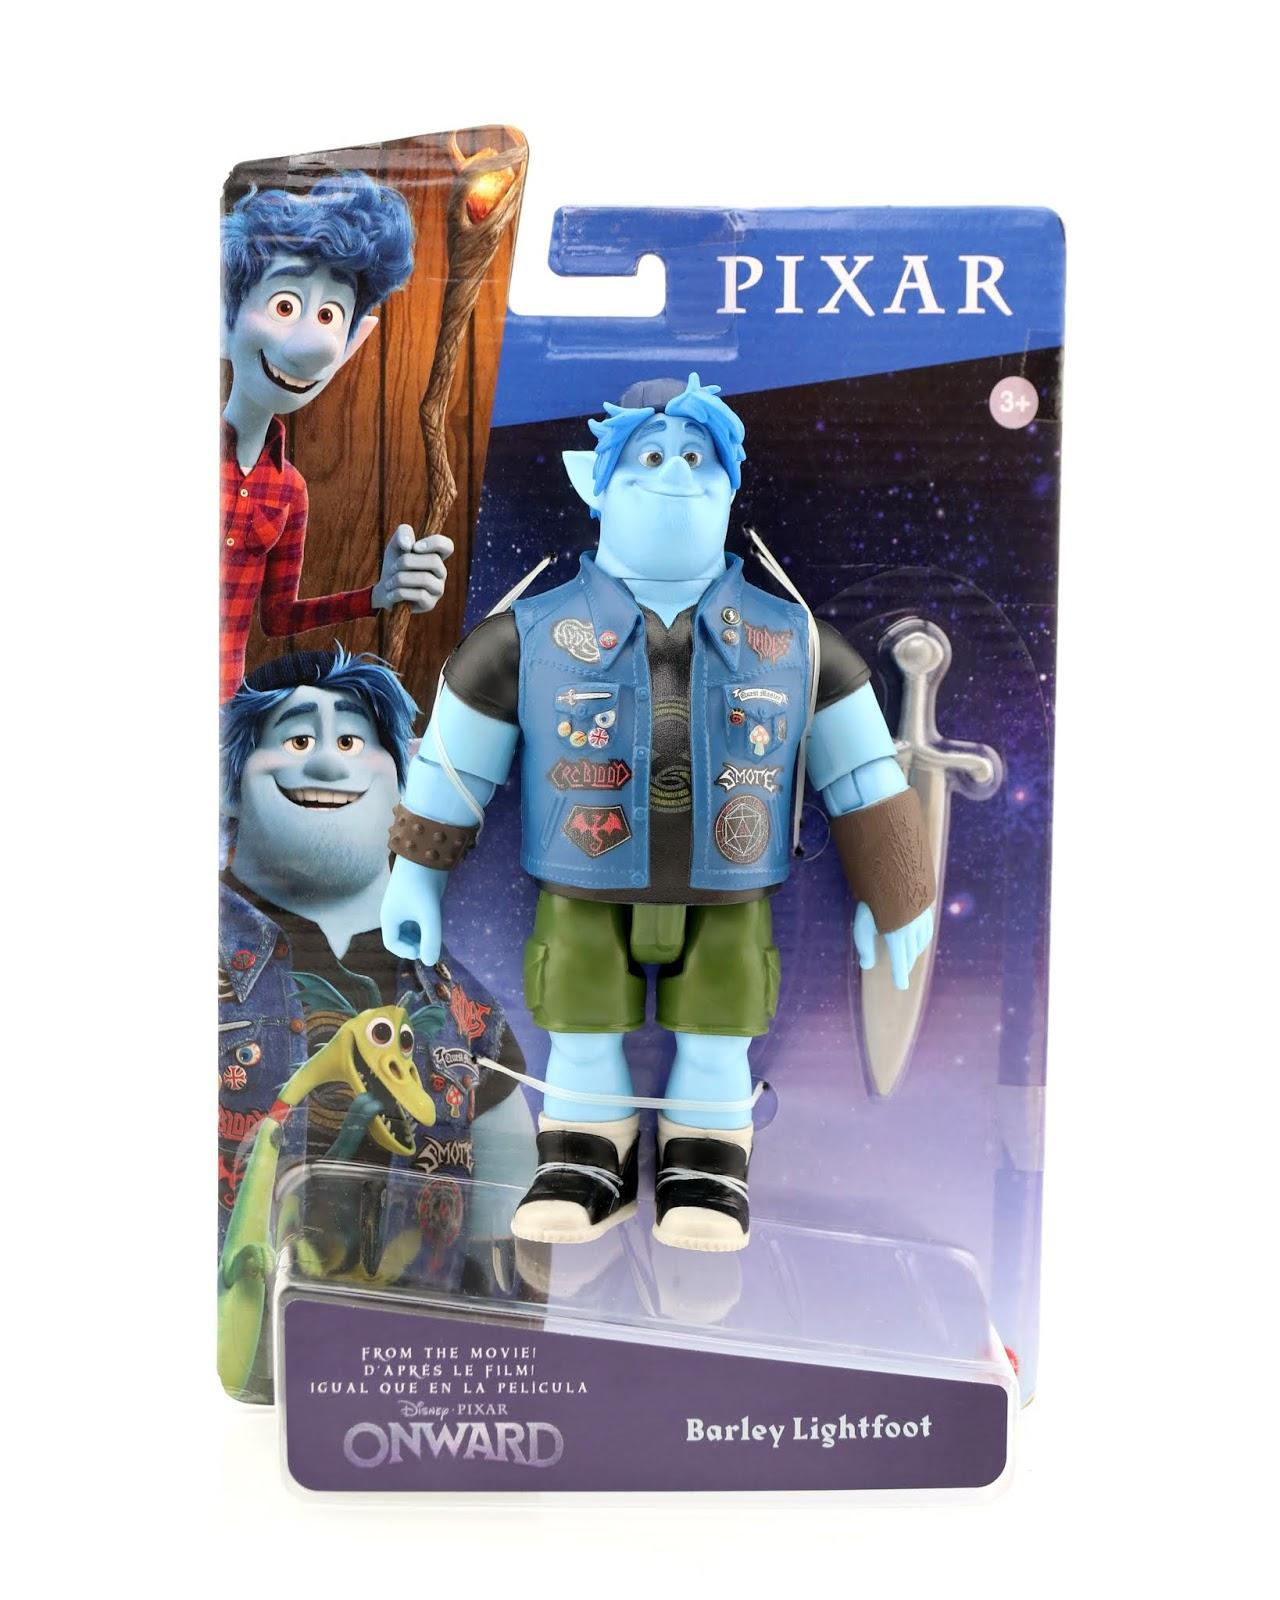 pixar onward action figures mattel barley